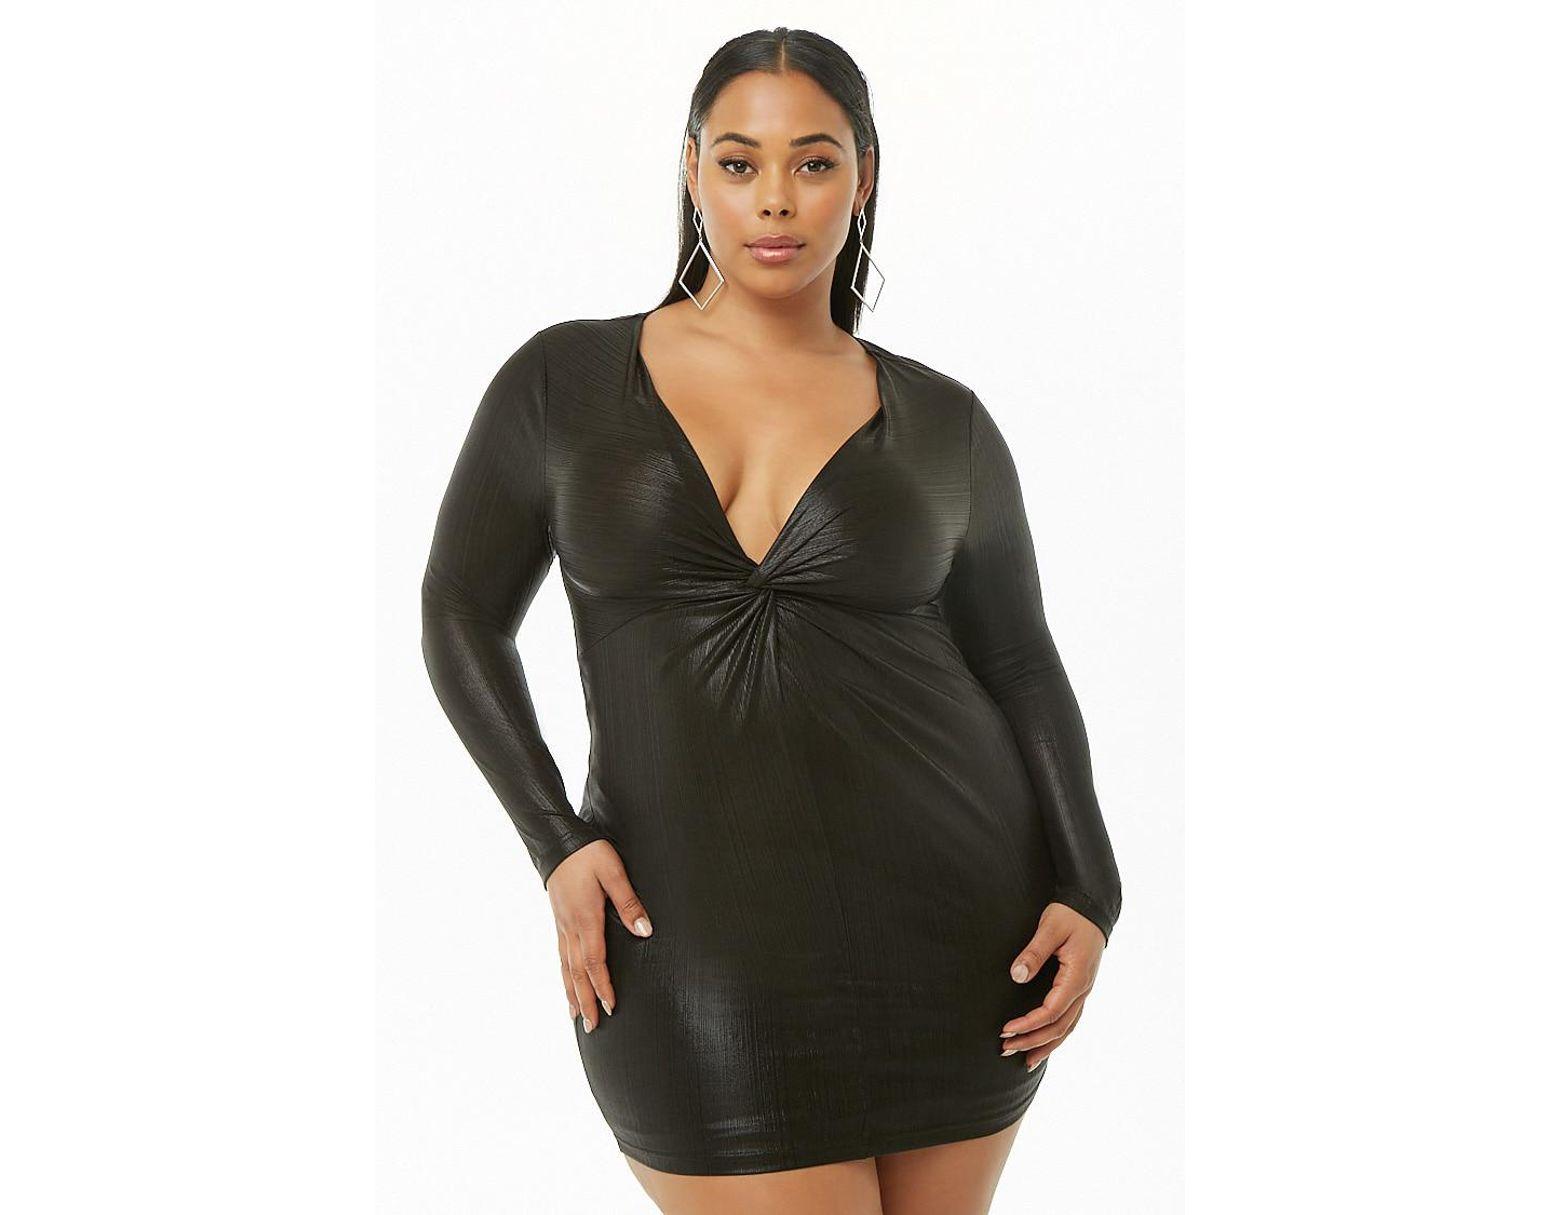 751bfd5a51 Forever 21 Women's Plus Size Metallic Twist-front Dress in Black - Lyst